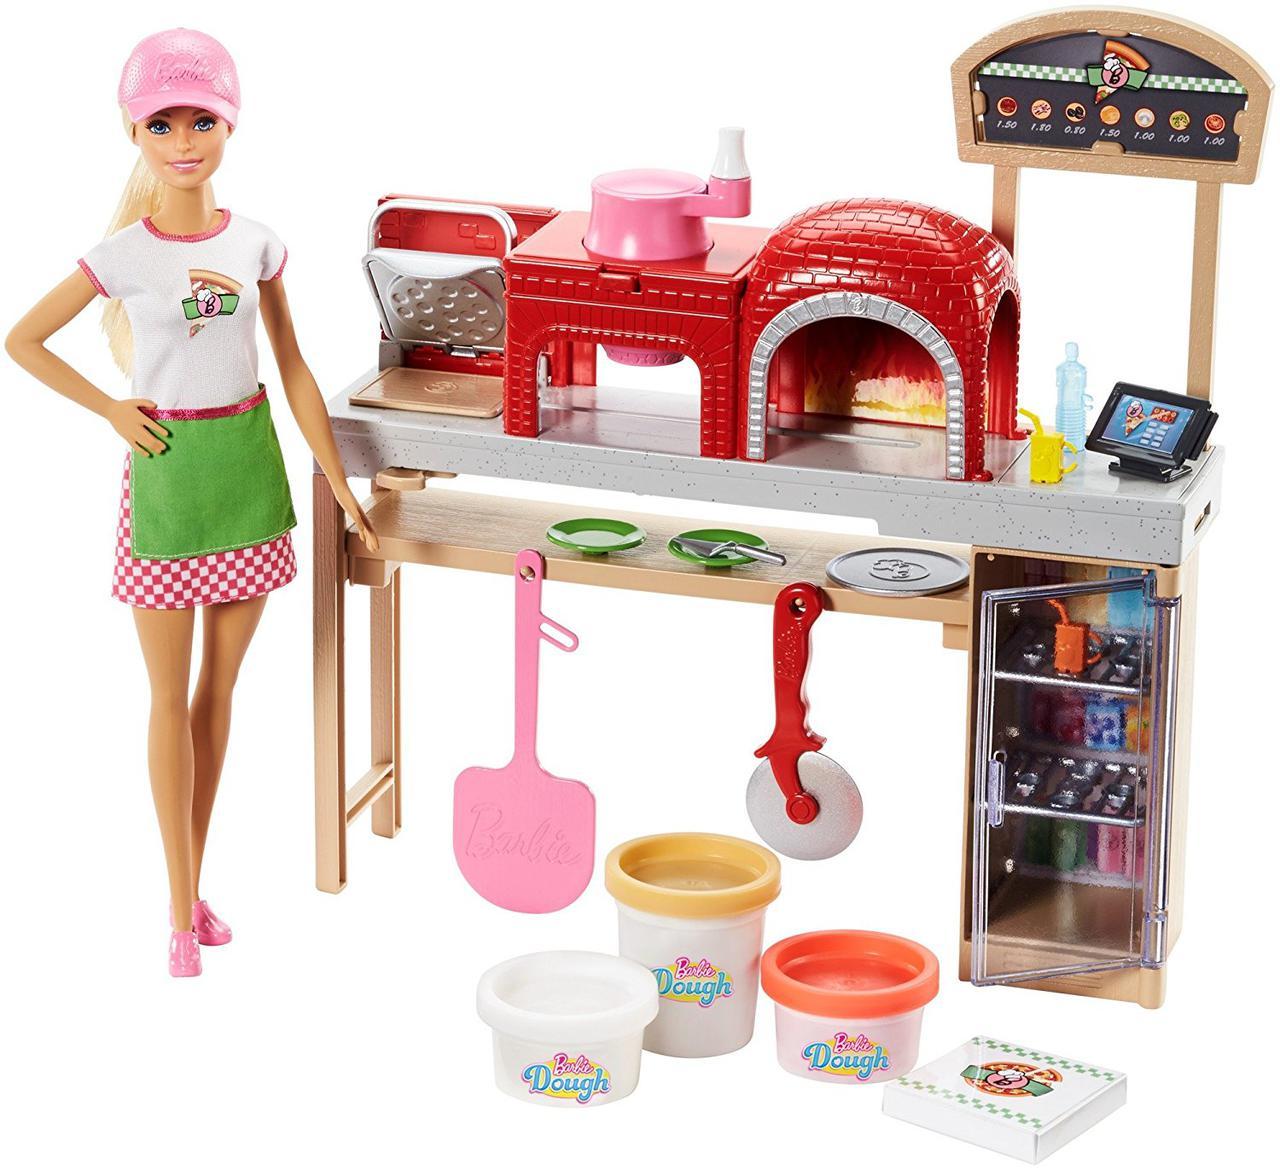 Набір Барбі Блондинка Піца-шеф з пластиліном Barbie Pizza Chef Doll and Playset, Blonde